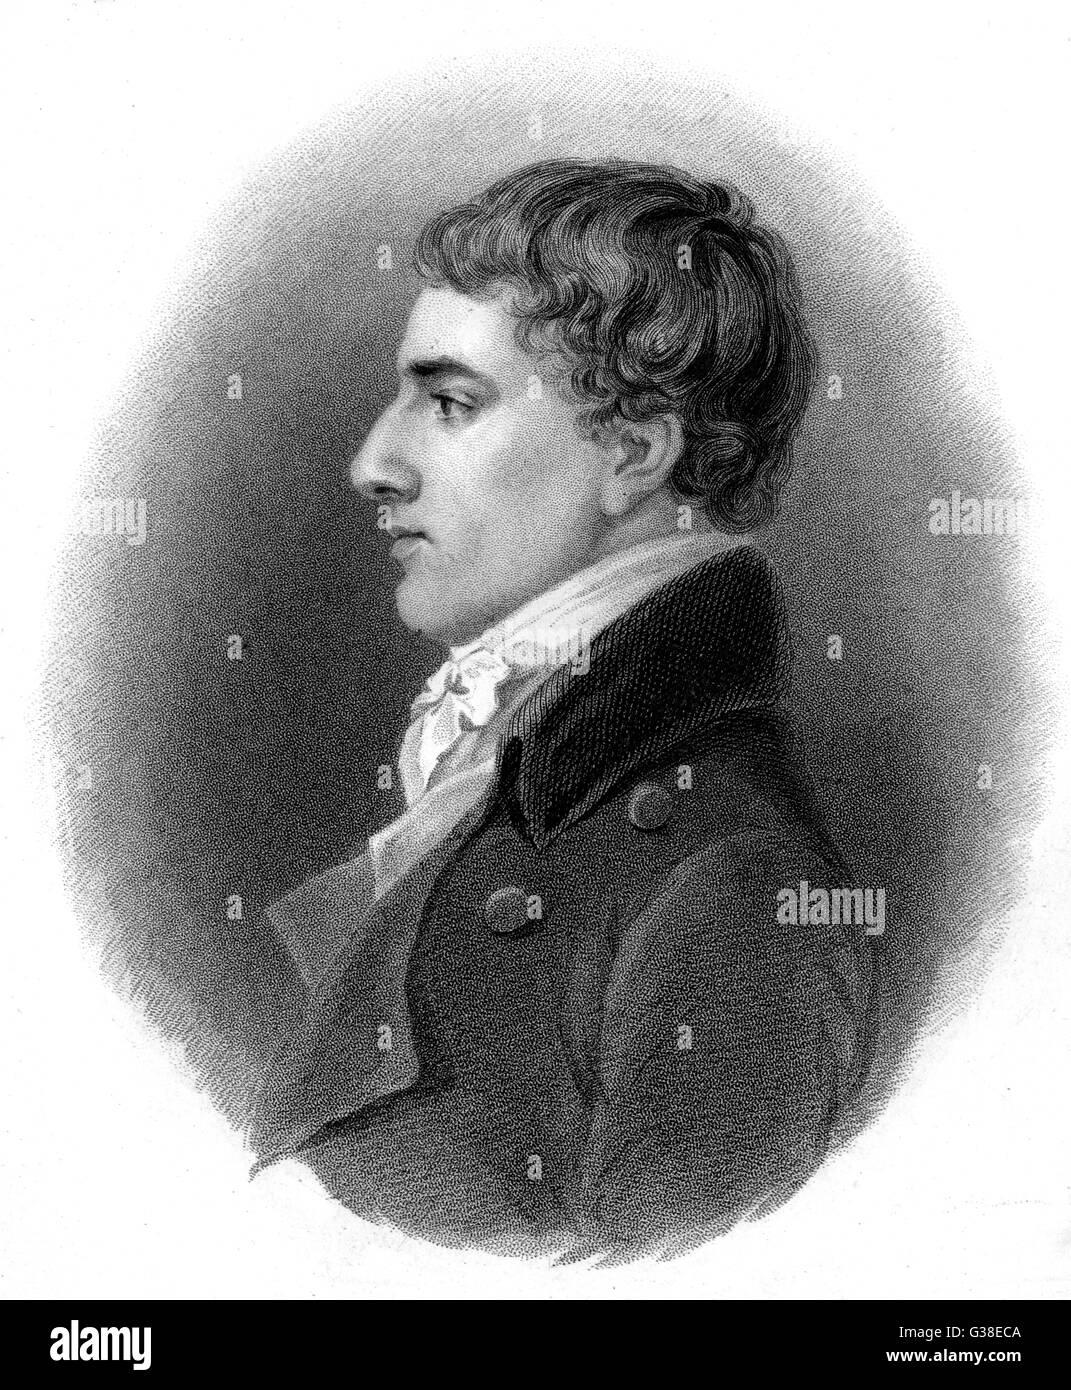 CHARLES LAMB -  English writer and critic        Date: 1775 - 1834 - Stock Image